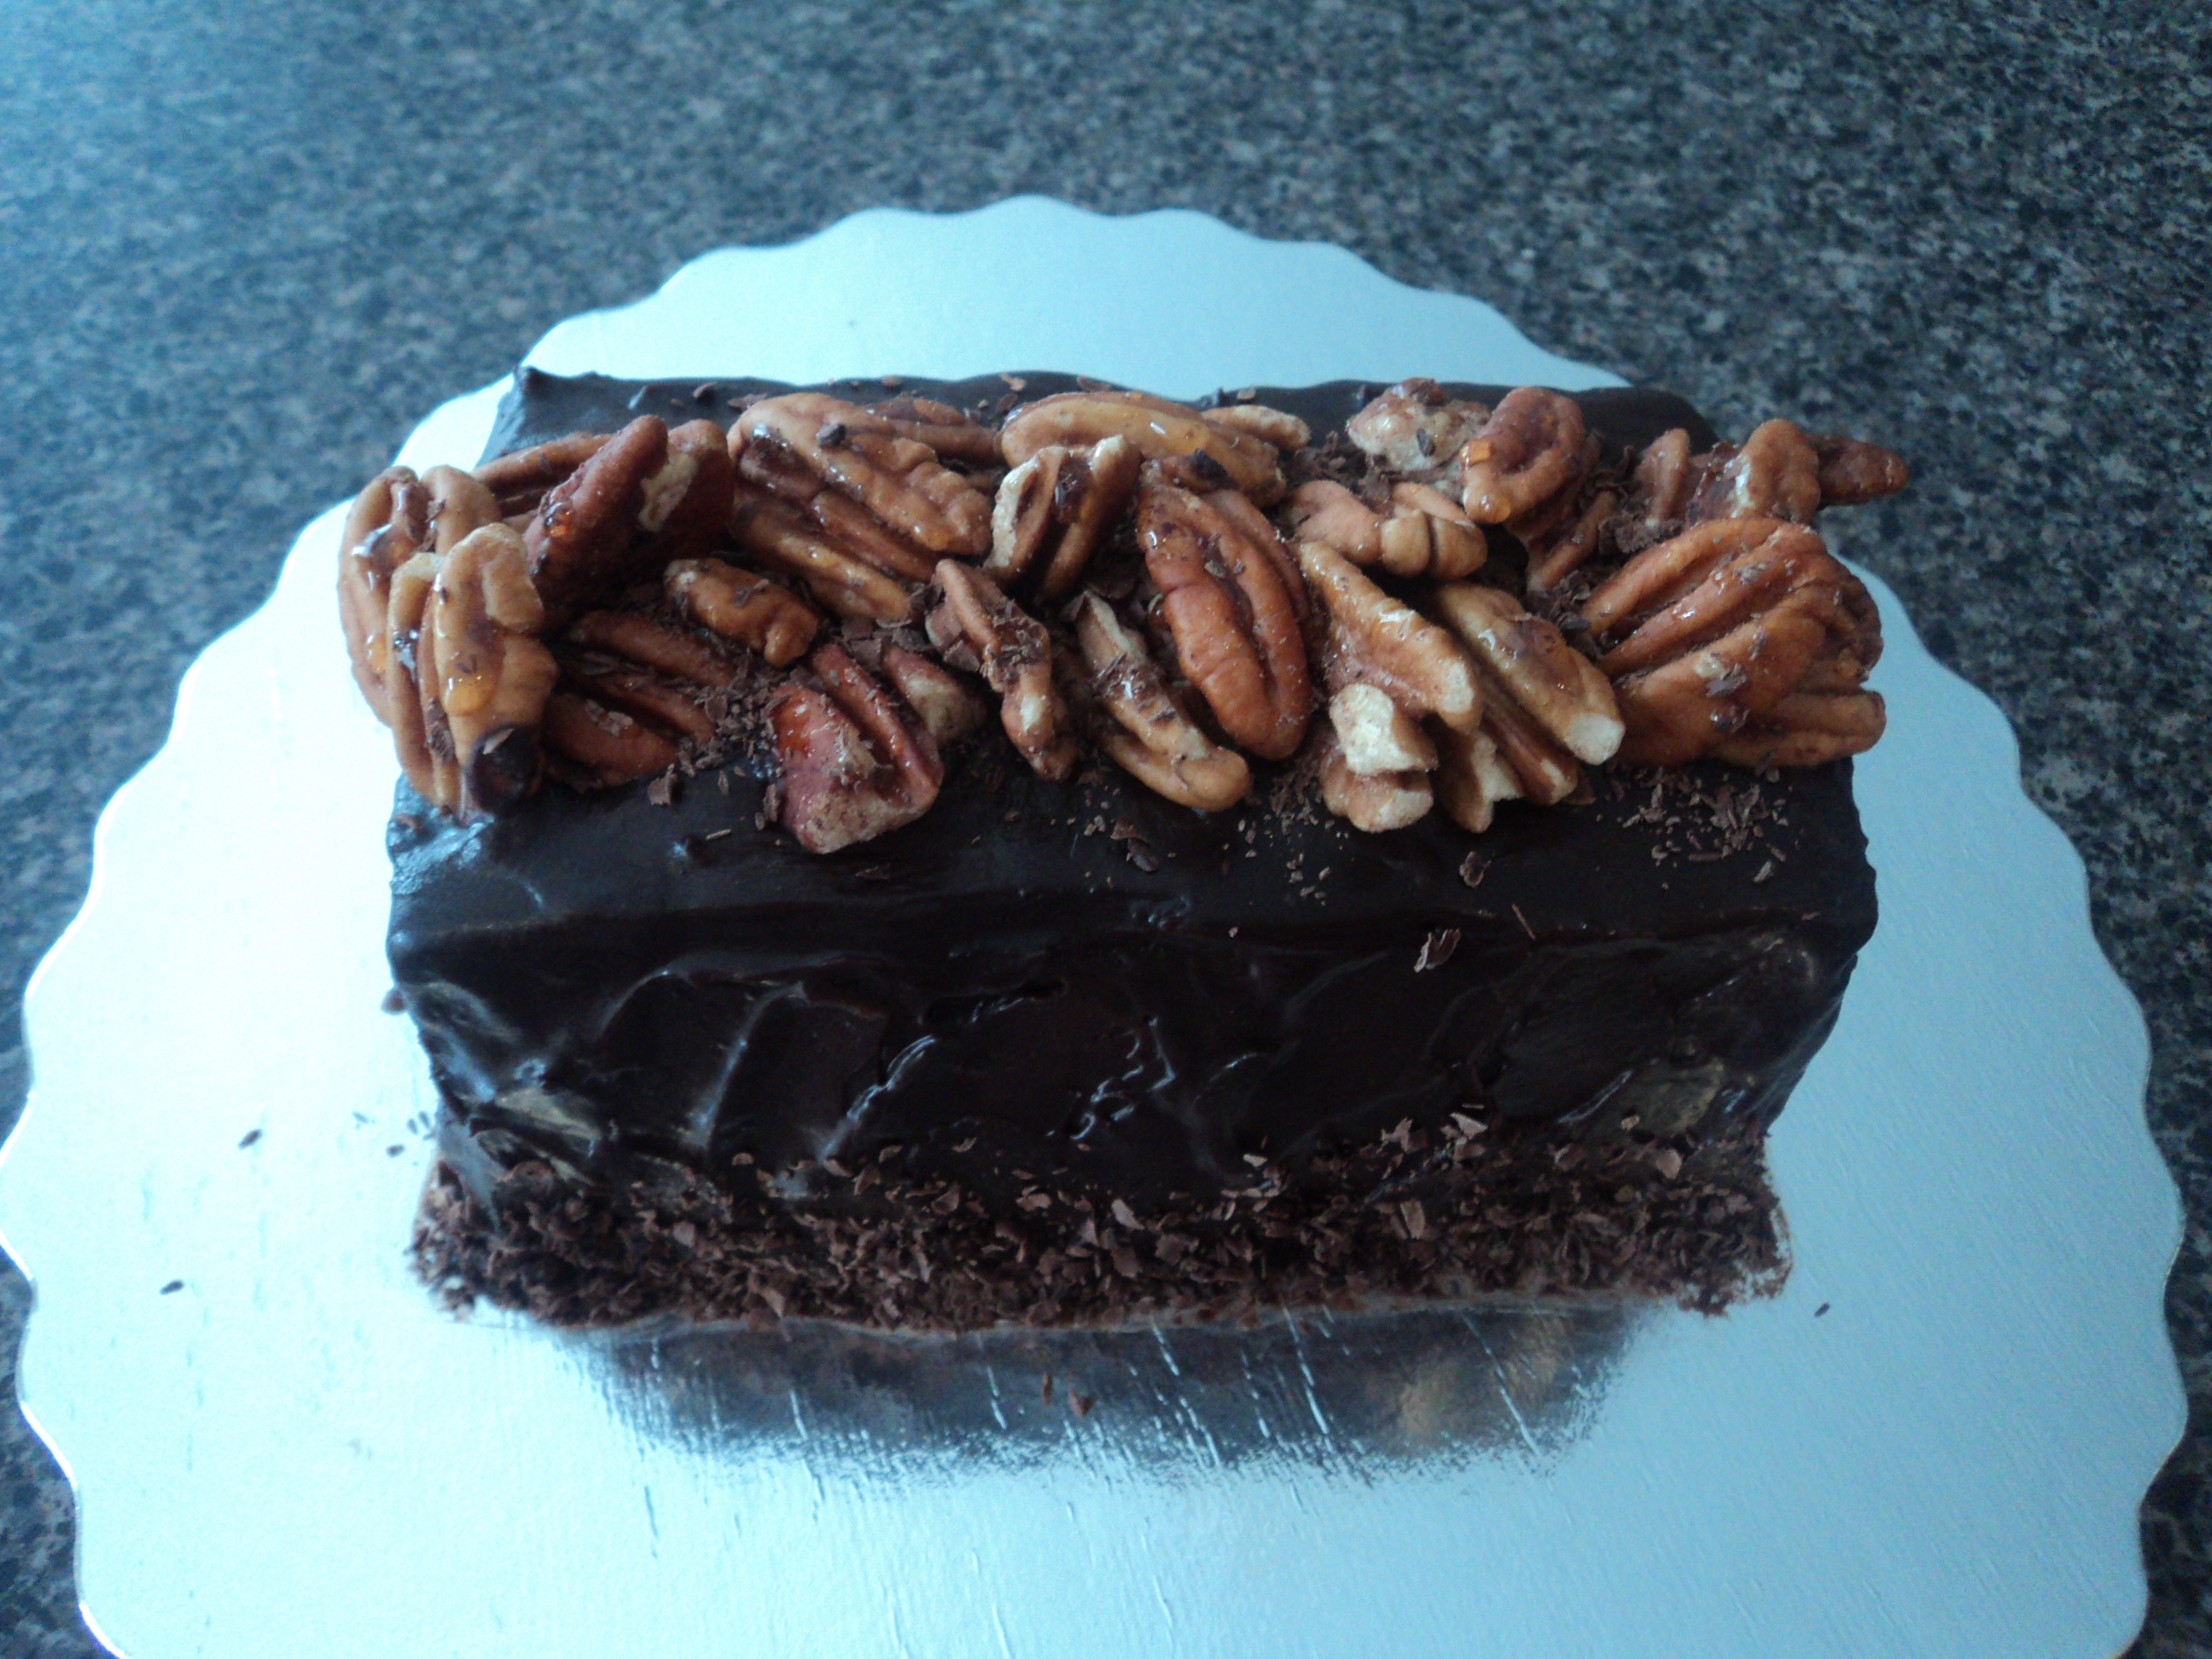 Crunchy Pecan Chocolate Cake